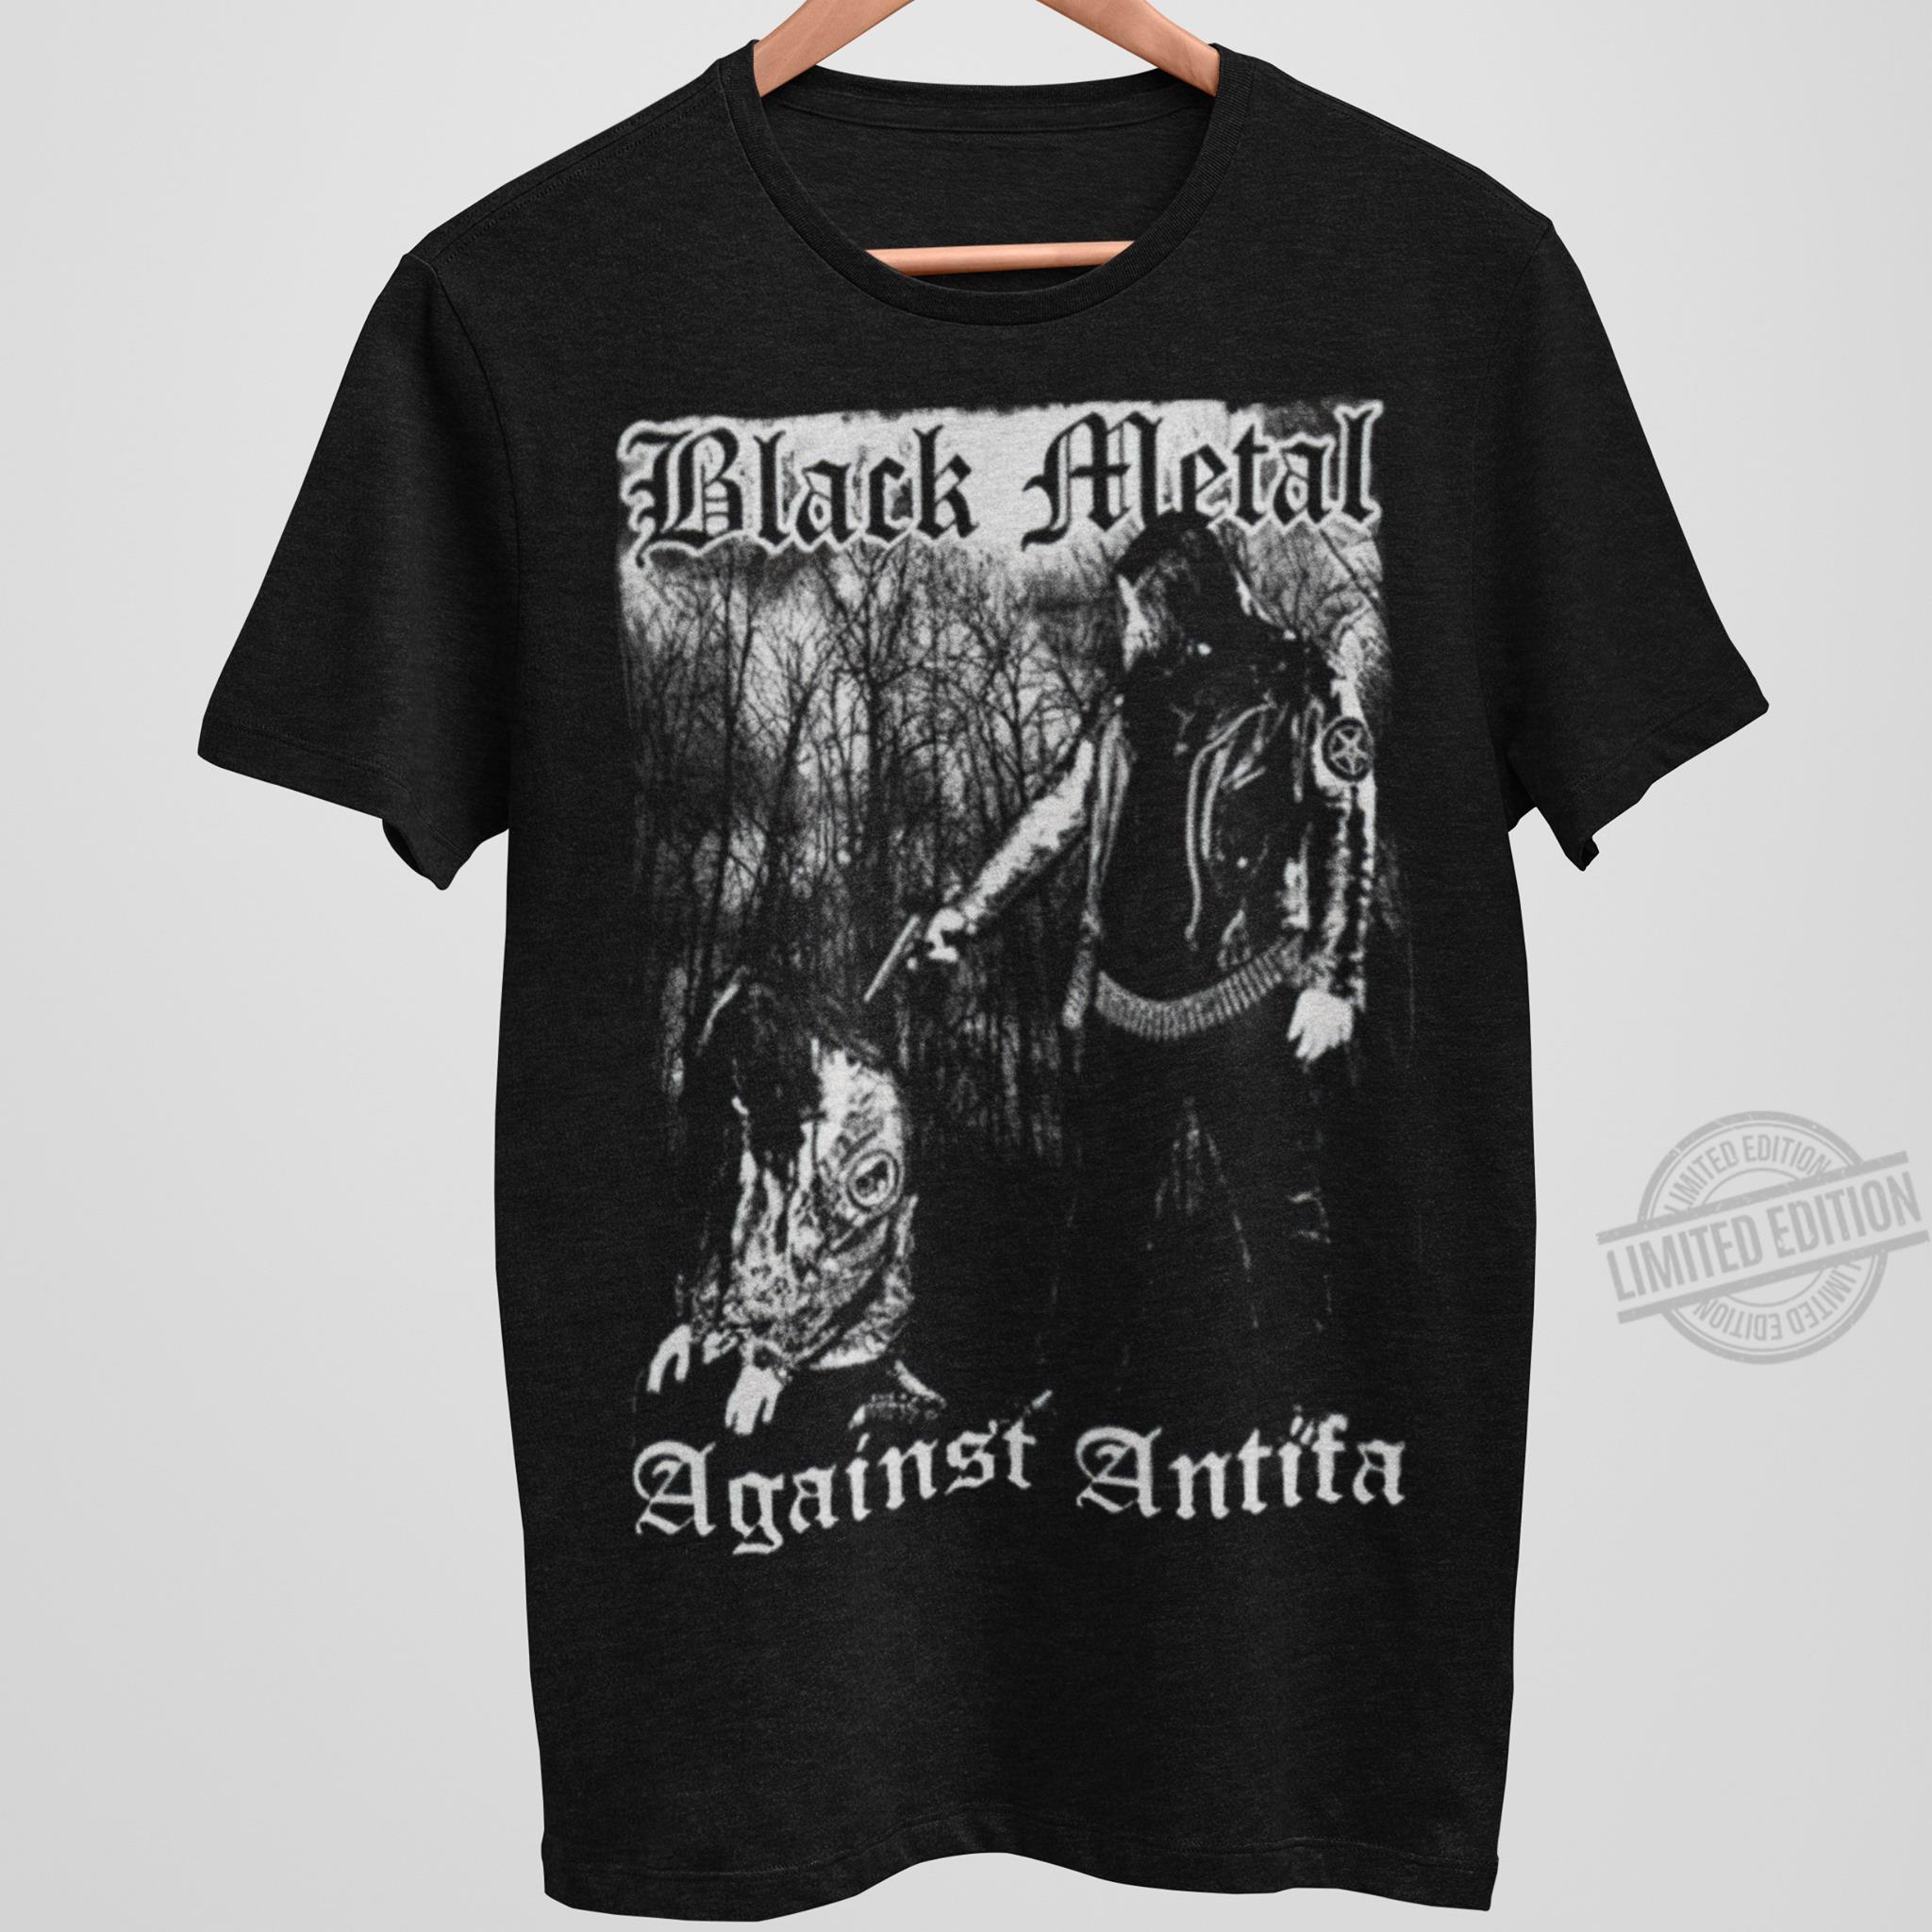 Black Metal Against Antifa Shirt